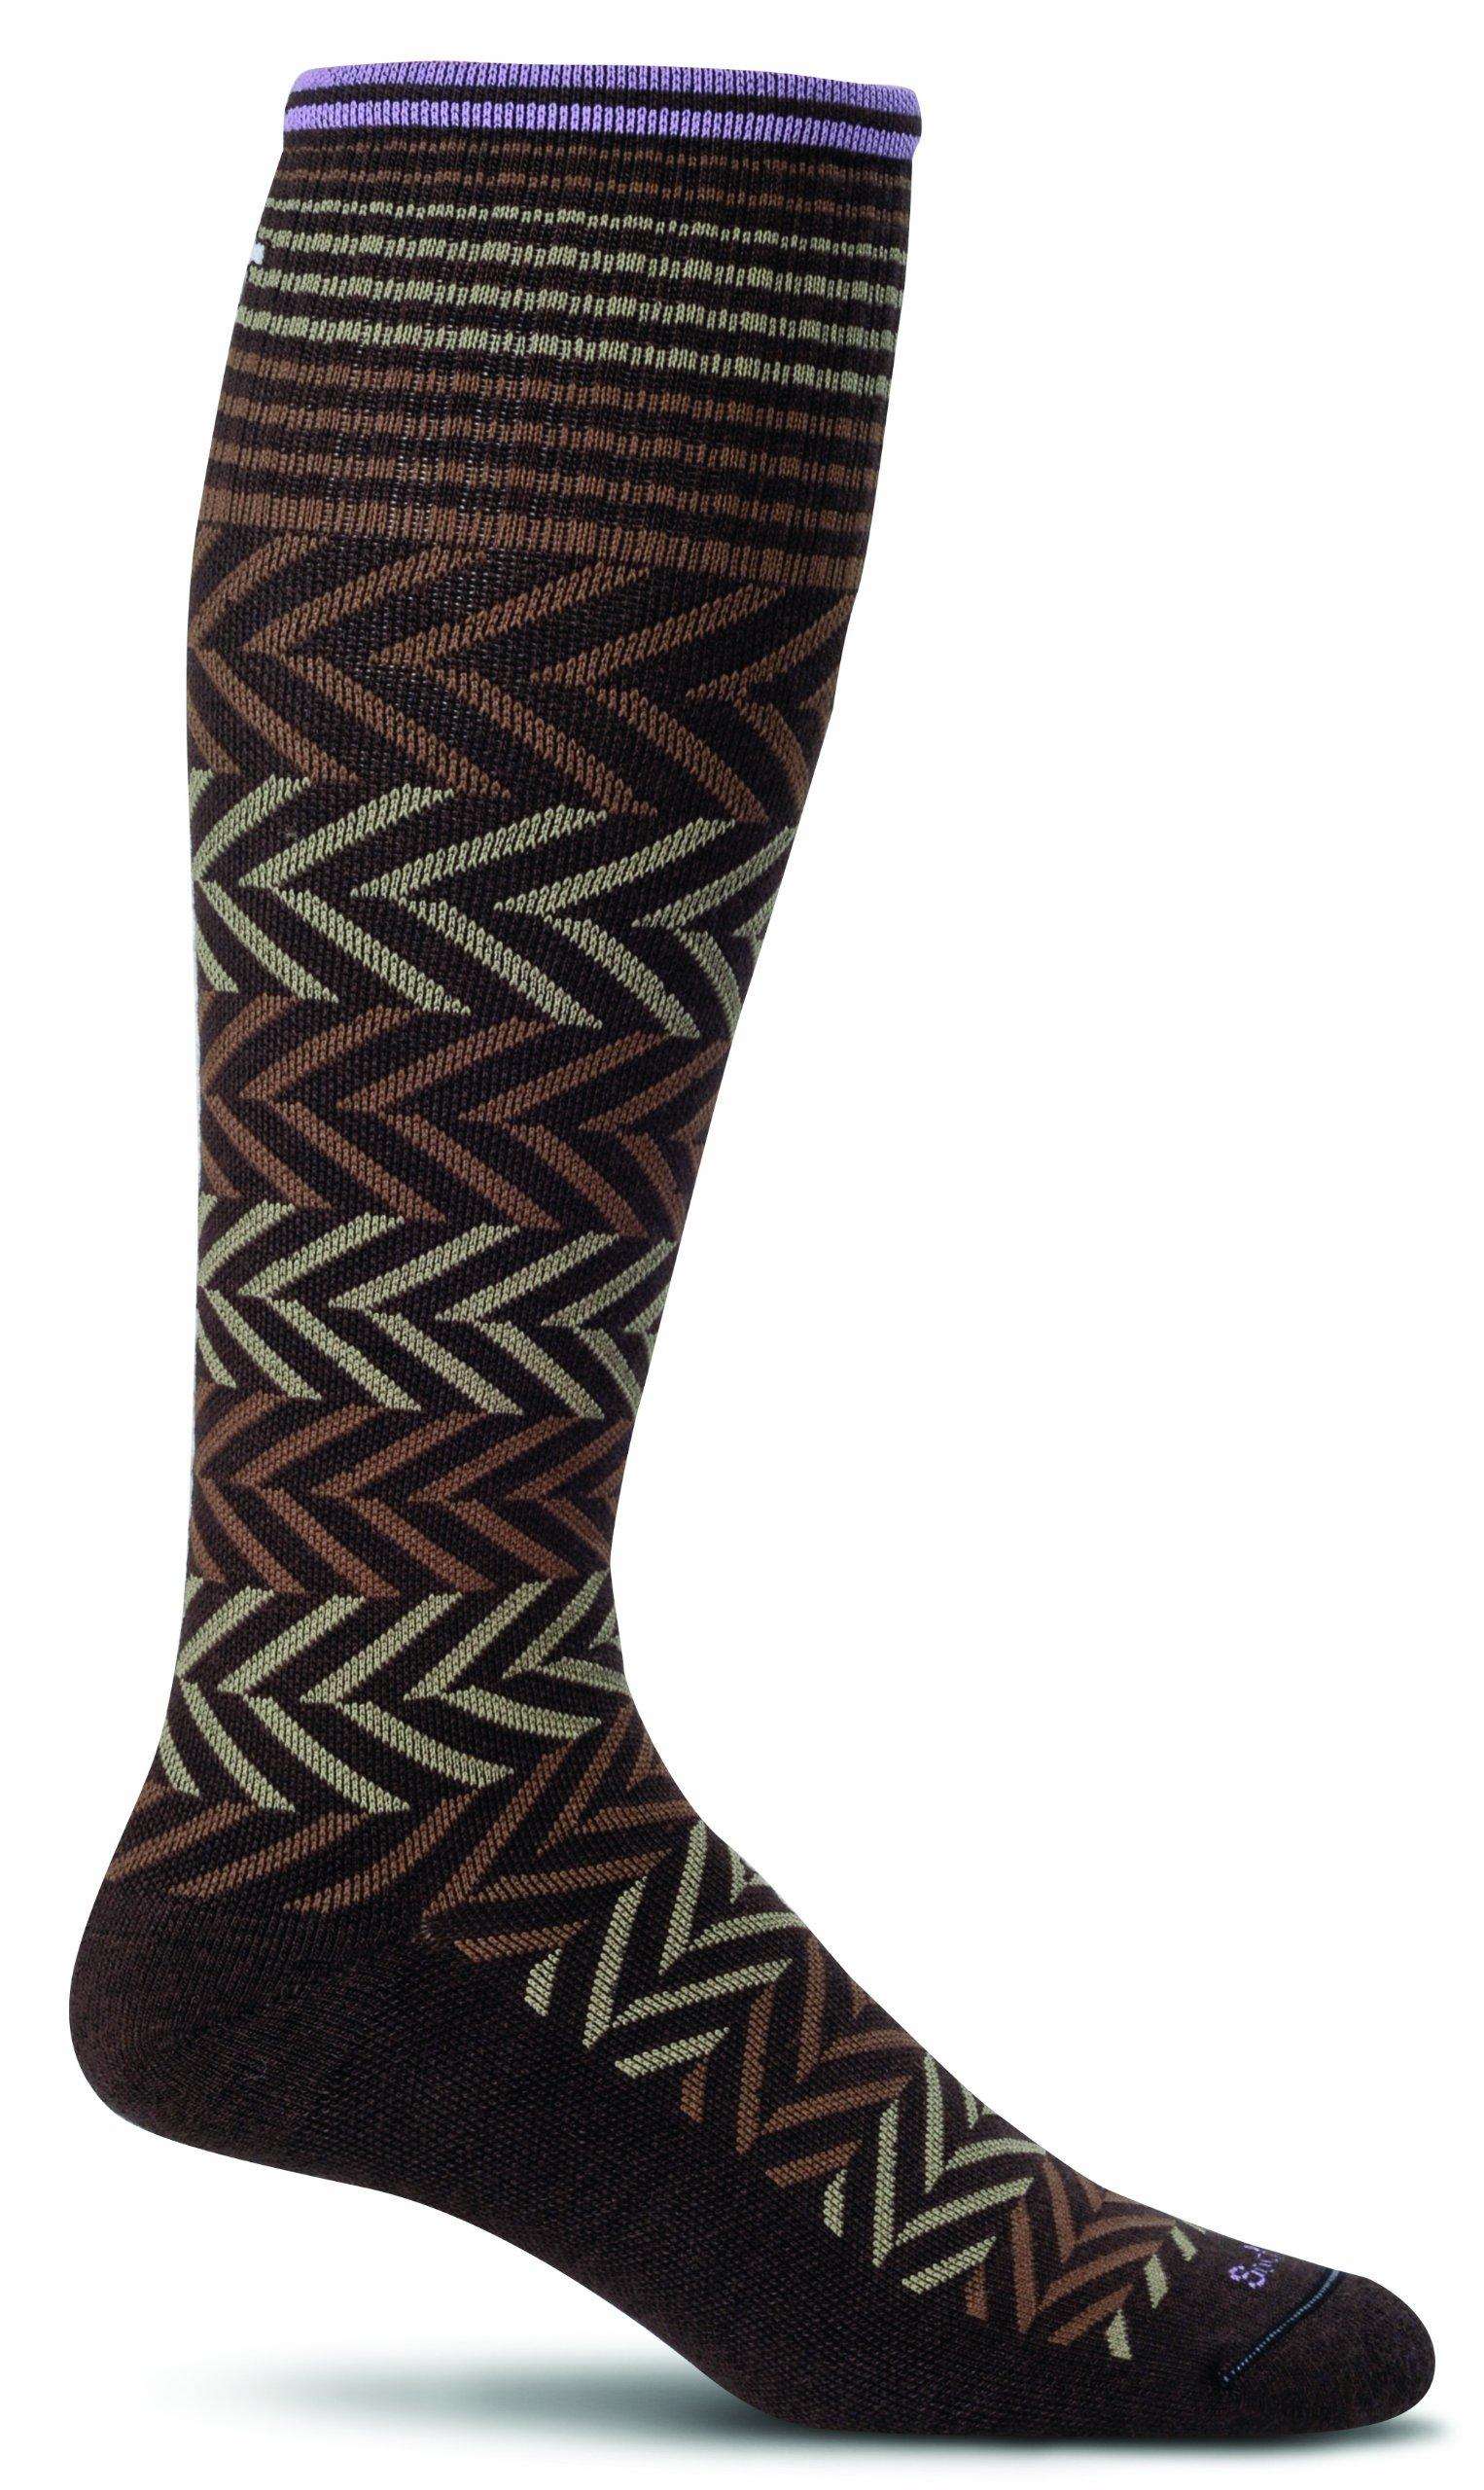 Sockwell Women's Chevron Graduated Compression Socks, Espresso, Small/Medium by Sockwell